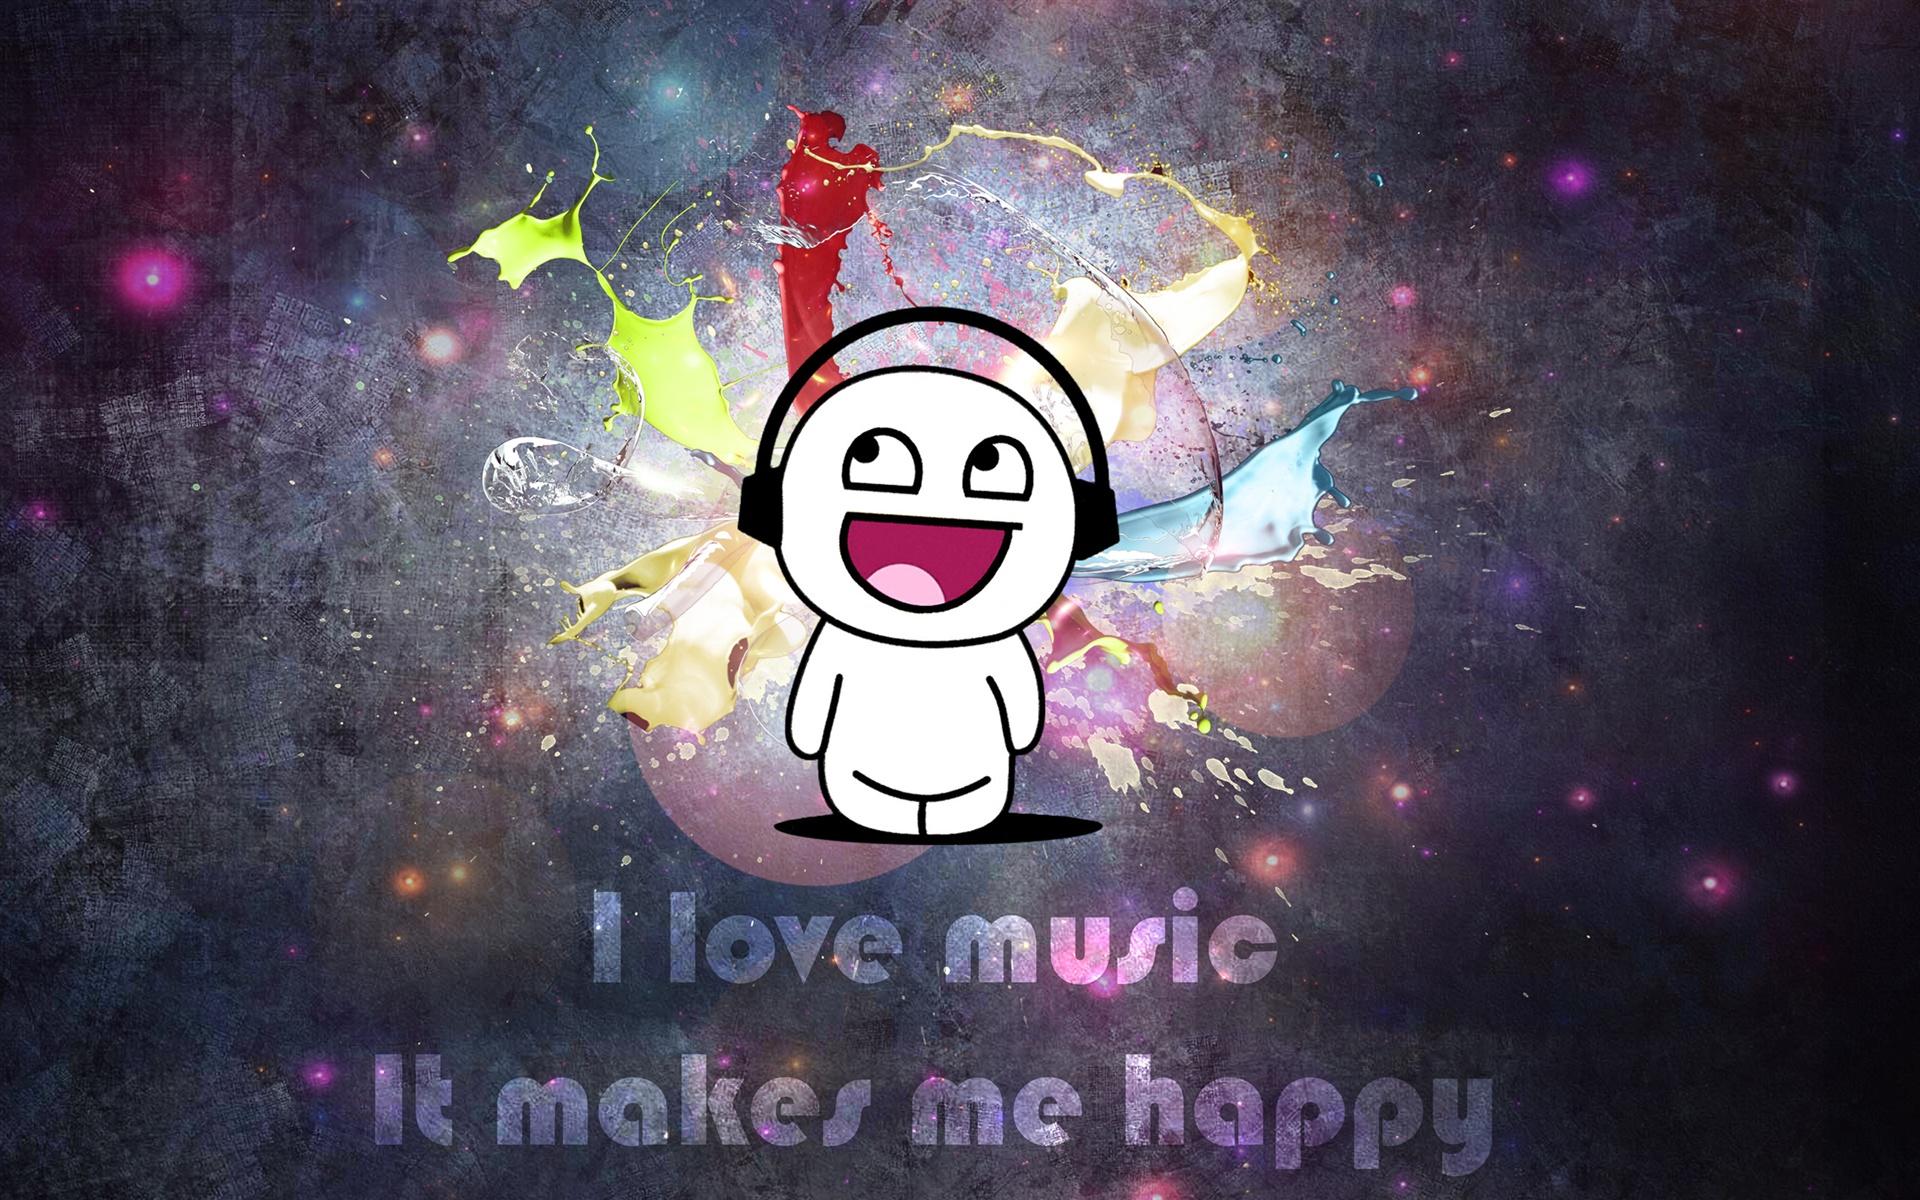 I Love Music Hd Wallpaper For Mobile: Wallpaper I Love Music, It Makes Me Happy 2560x1600 HD